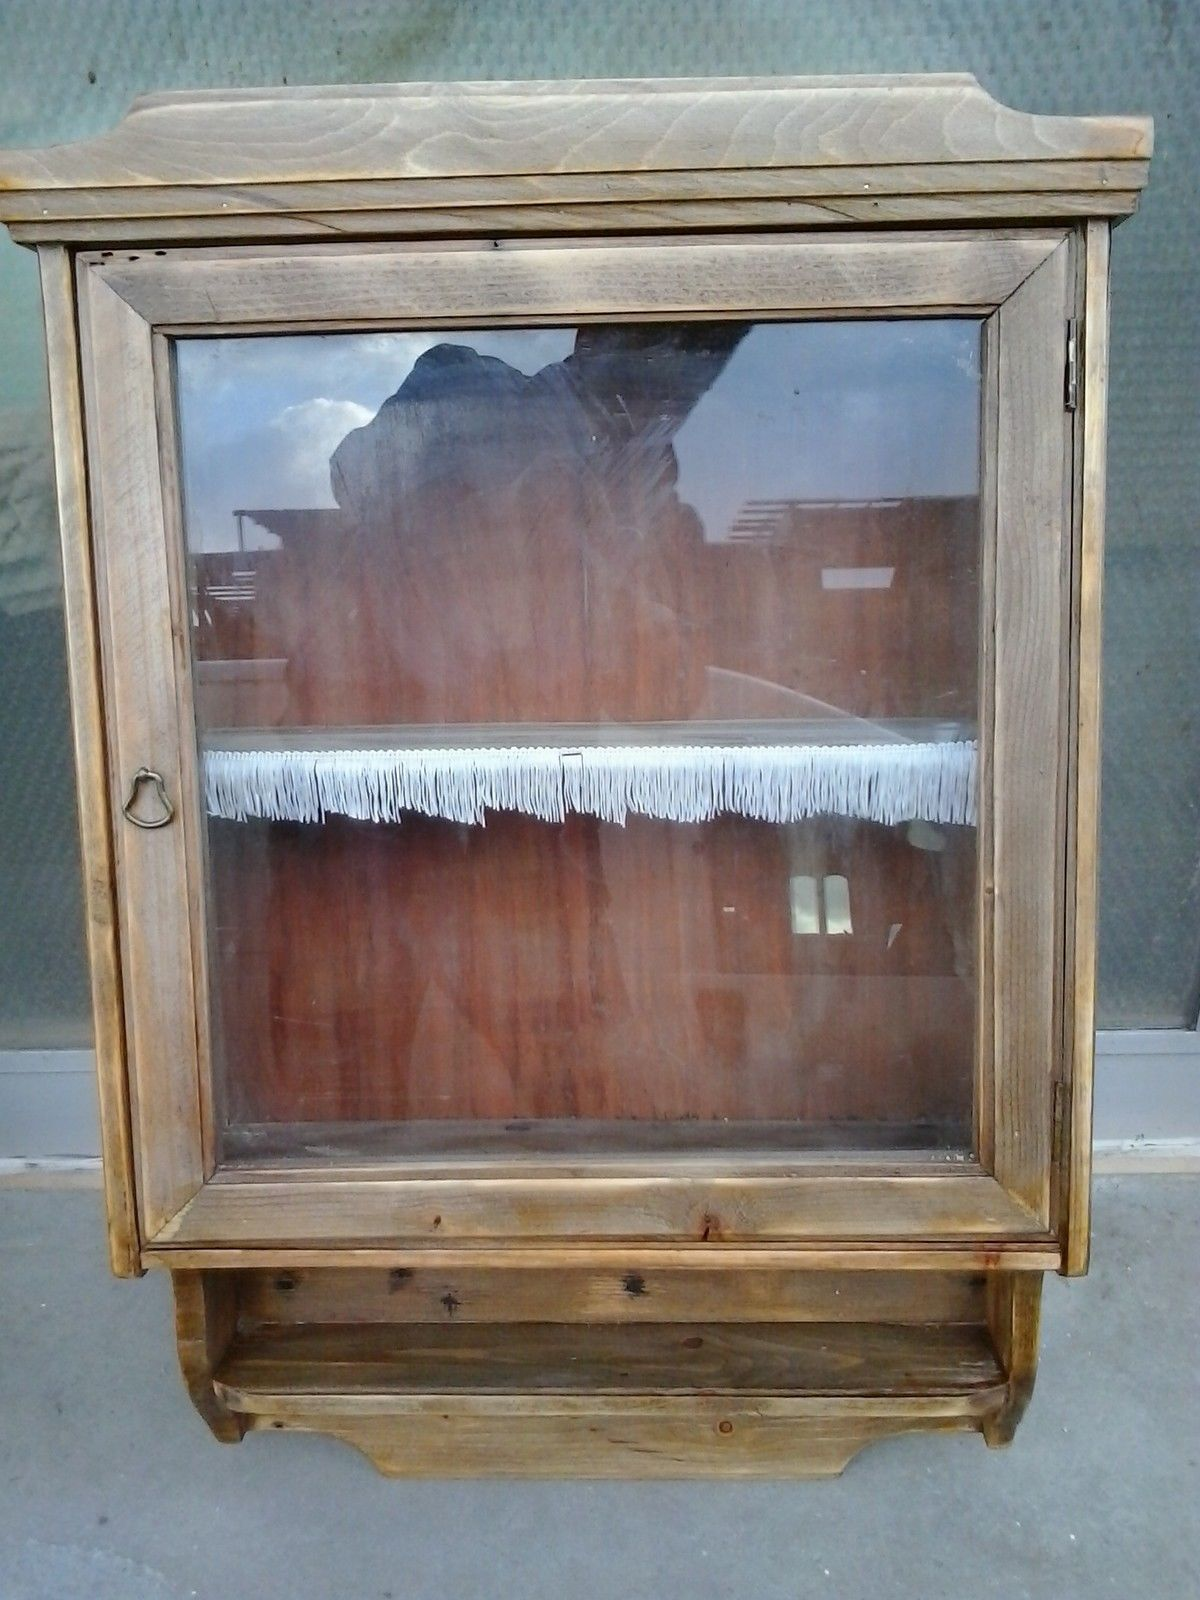 Vetrinette arte povera usate beautiful antica vetrinetta for Vetrinetta bassa arte povera